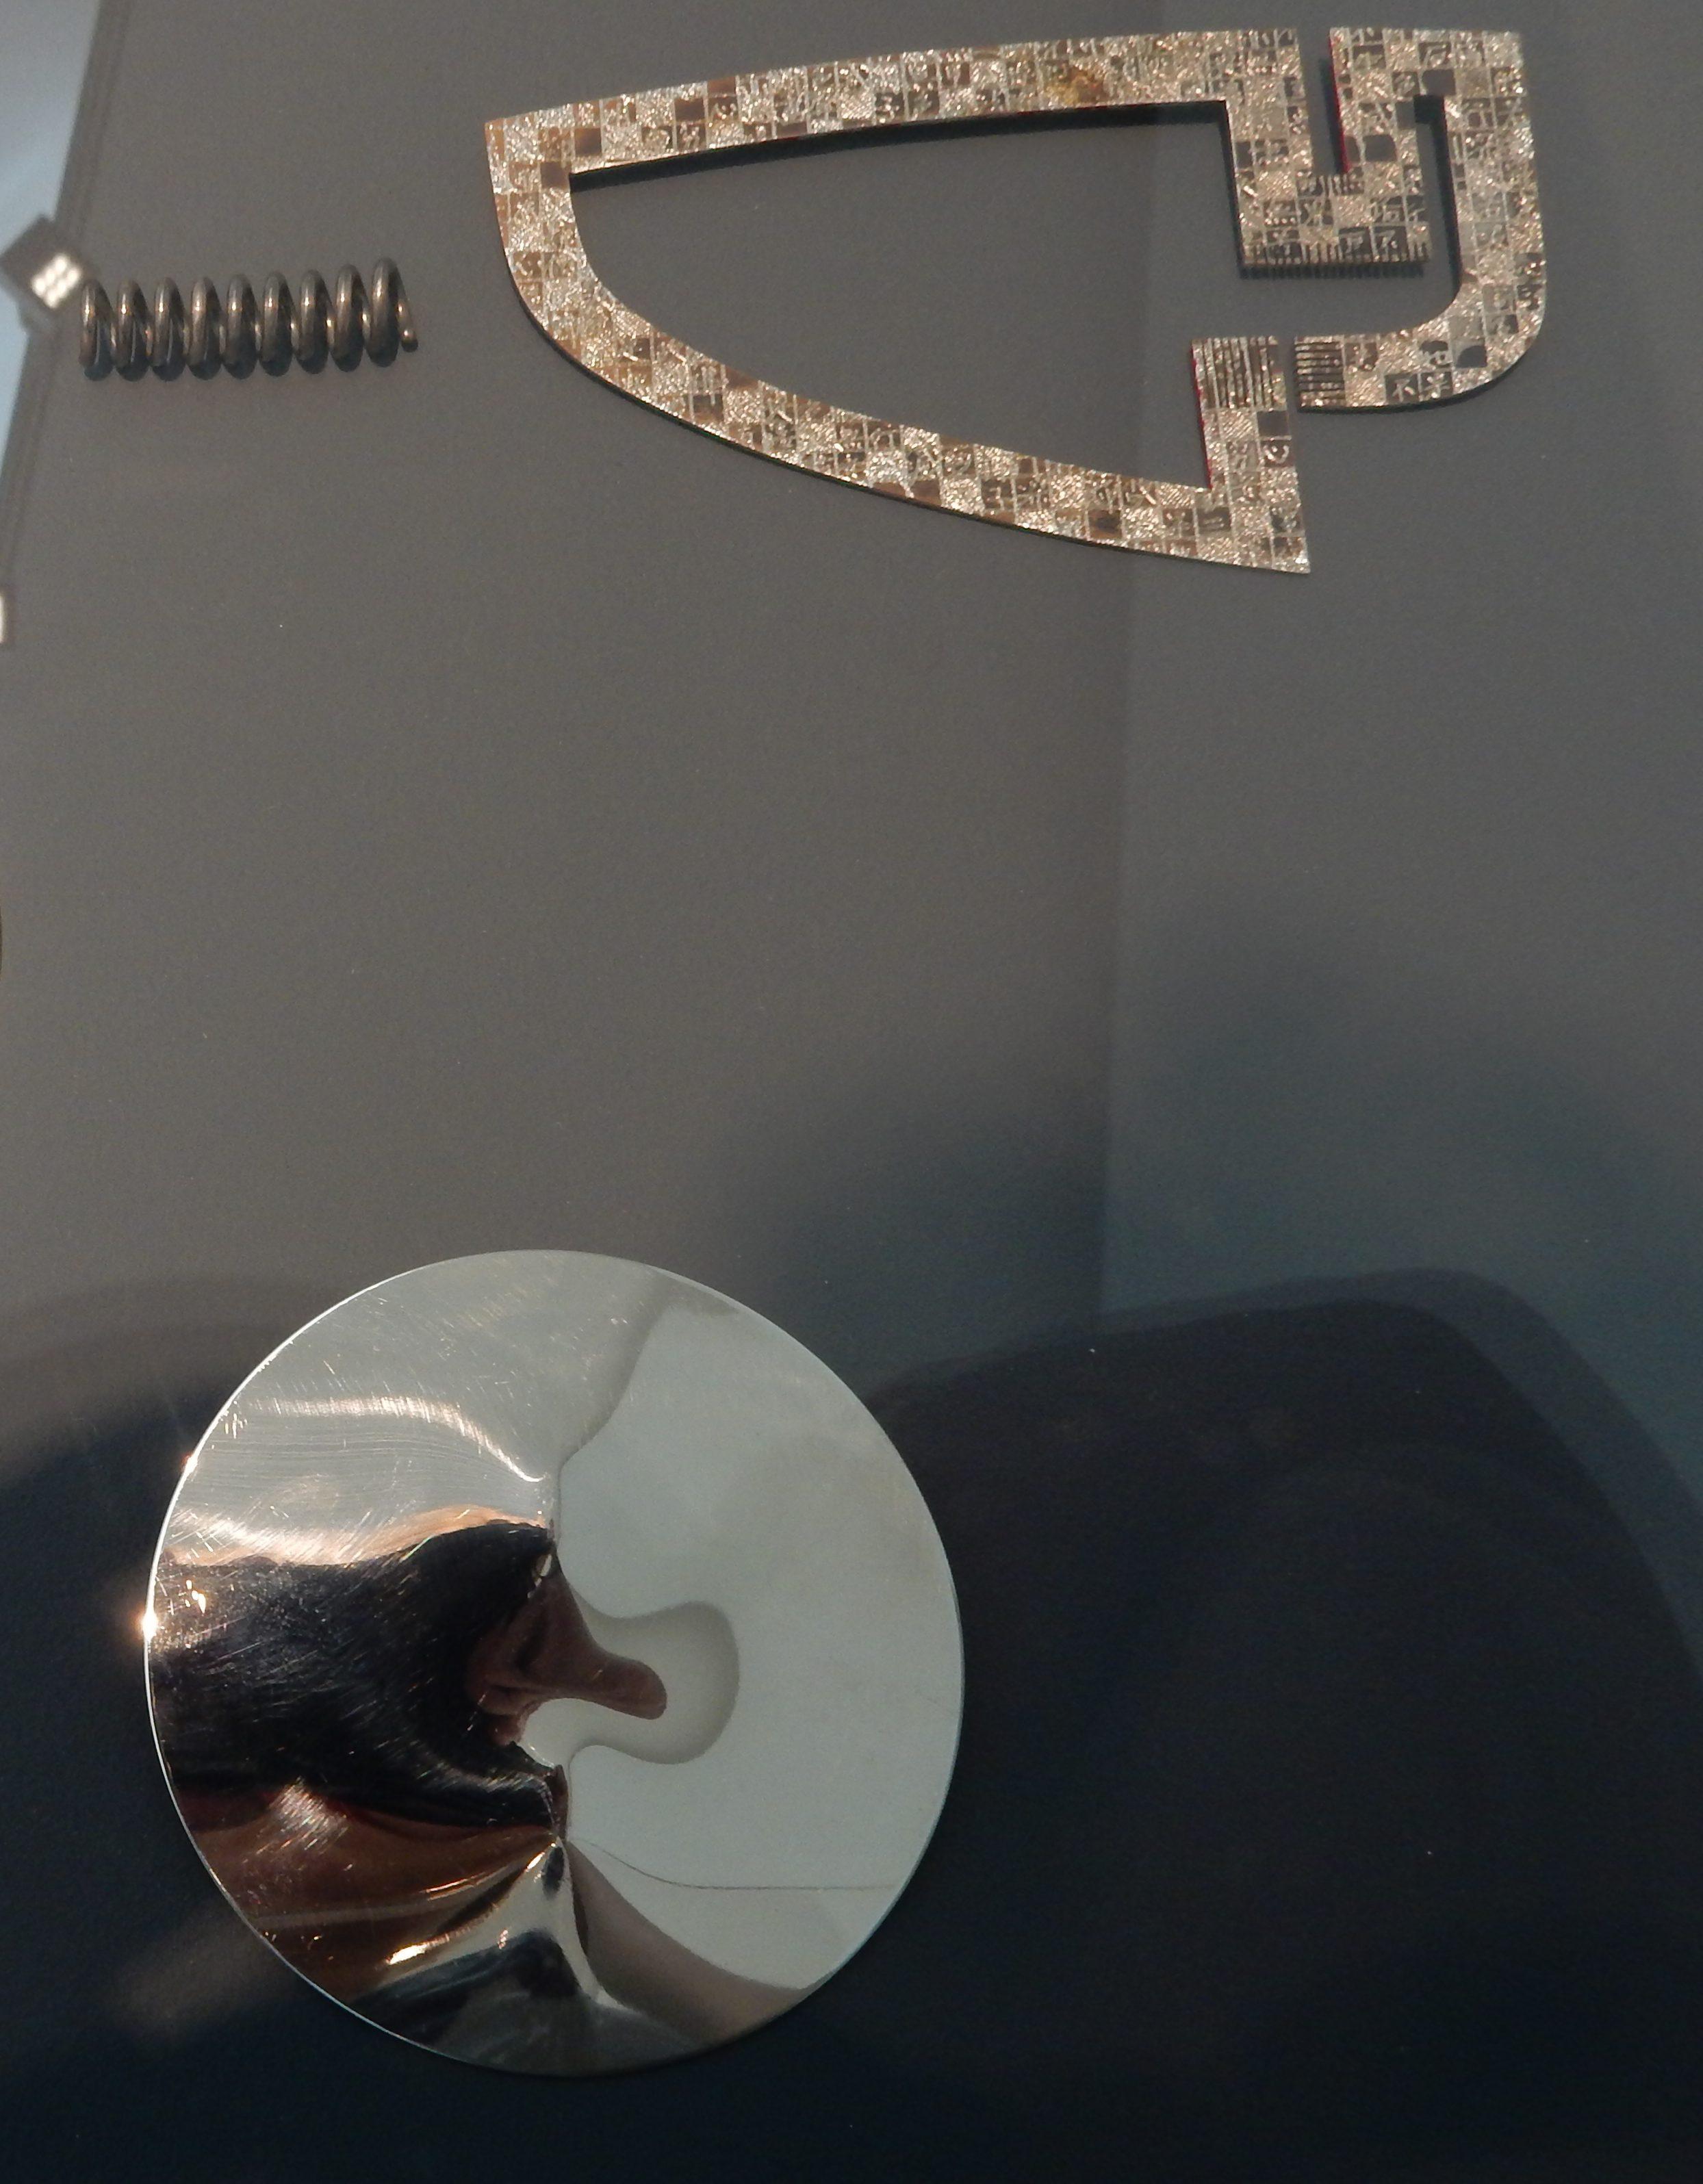 Paul Derrez, broche, 1976, Masako Hamaguchi, broche, circa 1989 en Jan Tempelman, broche, 1969. Collectie Benno Premsela, Show yourself, Design Museum Den Bosch, tentoonstelling, vitrine, metalen